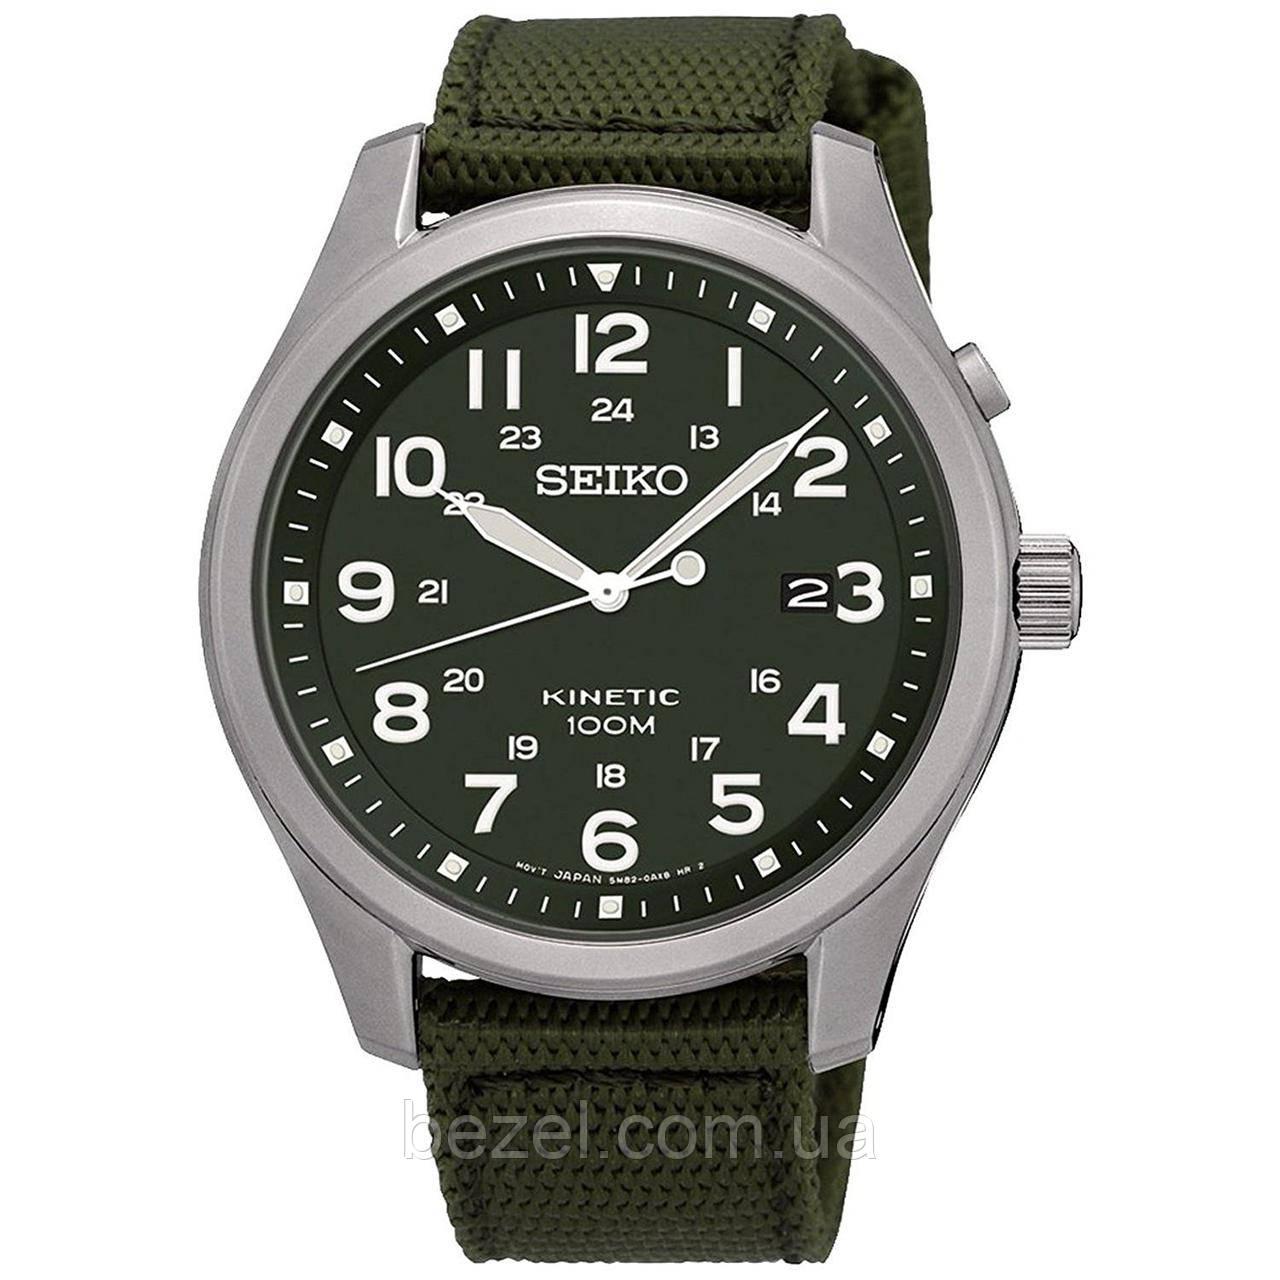 Часы наручные мужские seiko kinetic подставка для хранения часов наручных